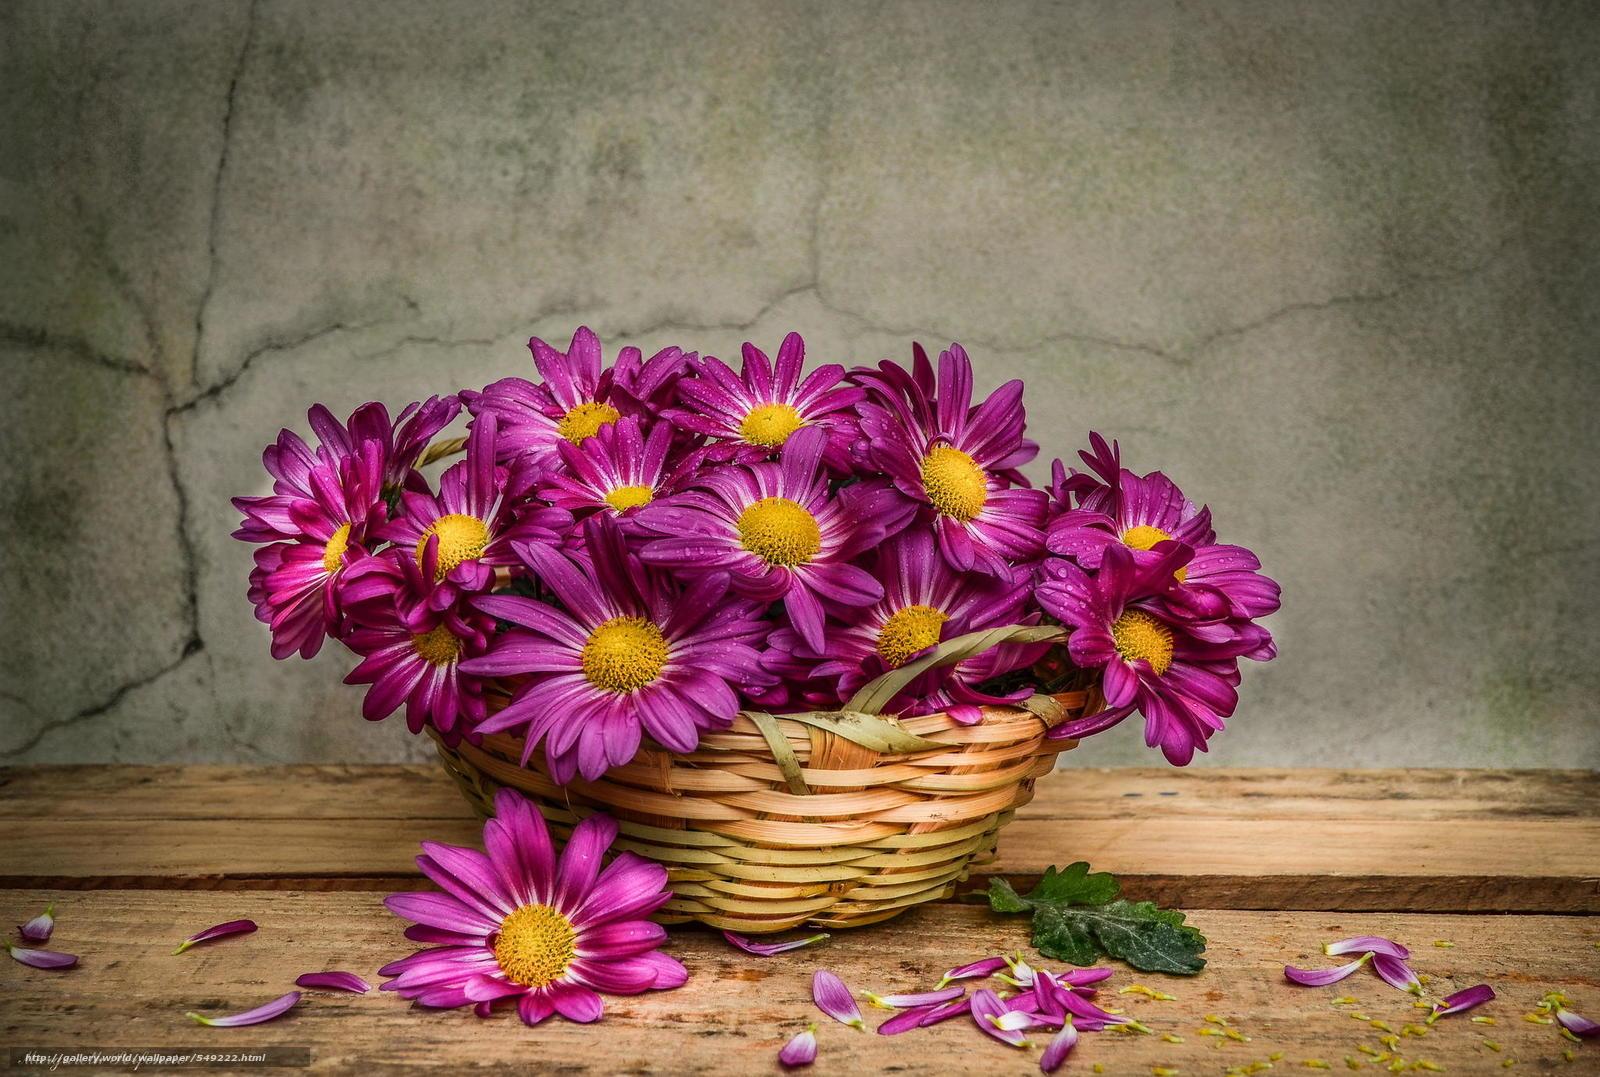 Flower Baskets Hd : Download wallpaper nature flowers flower bouquet free